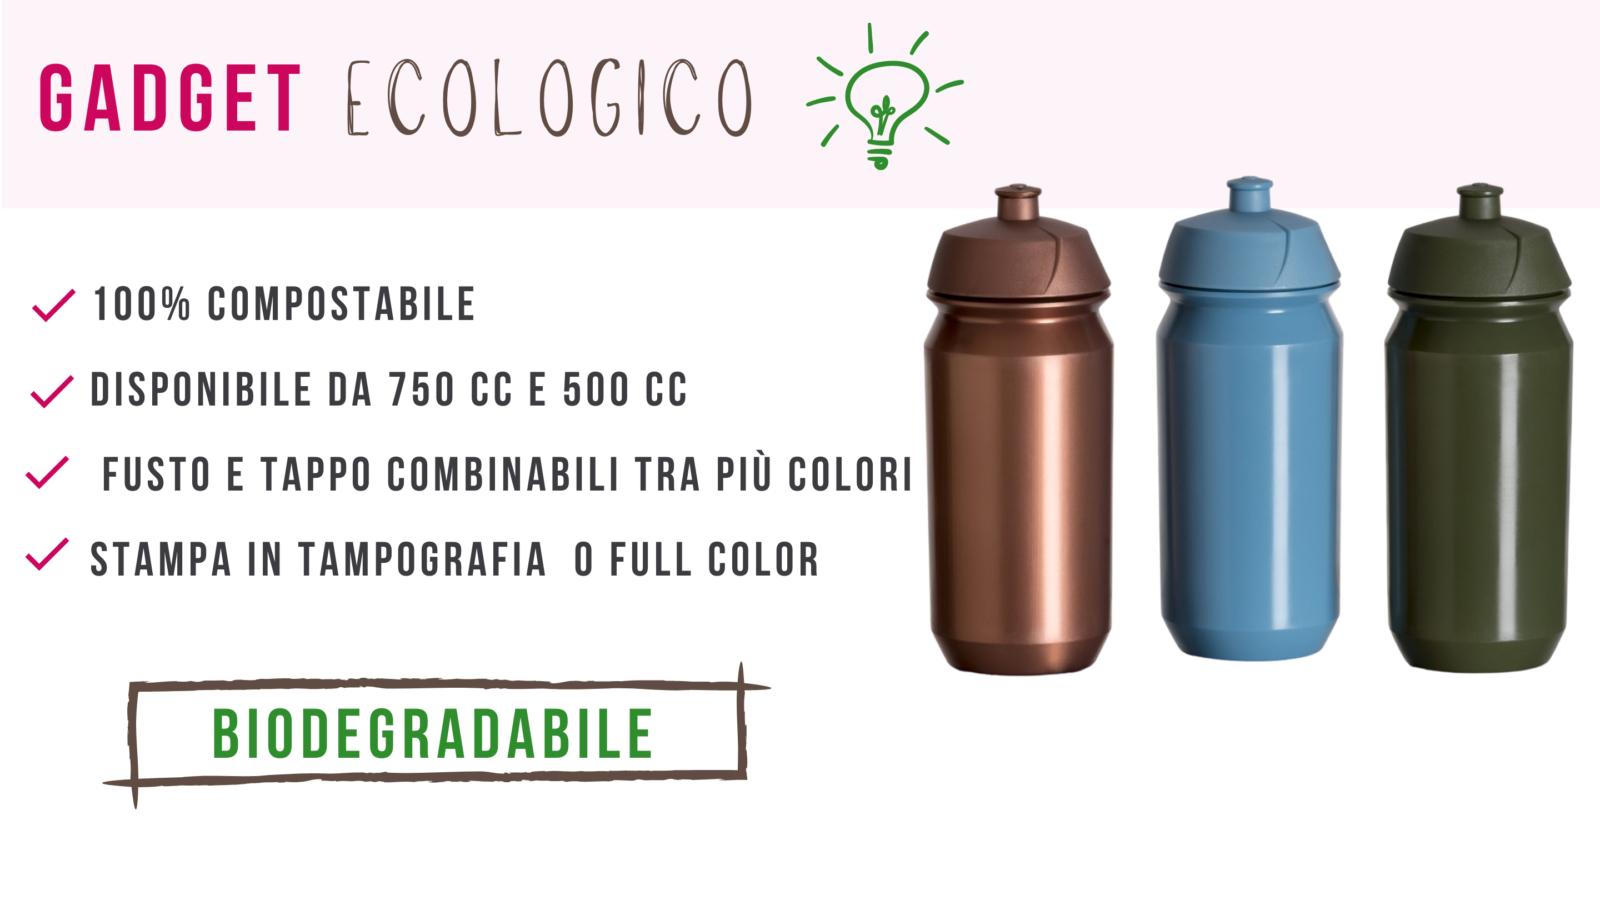 Gadget biodegradabili